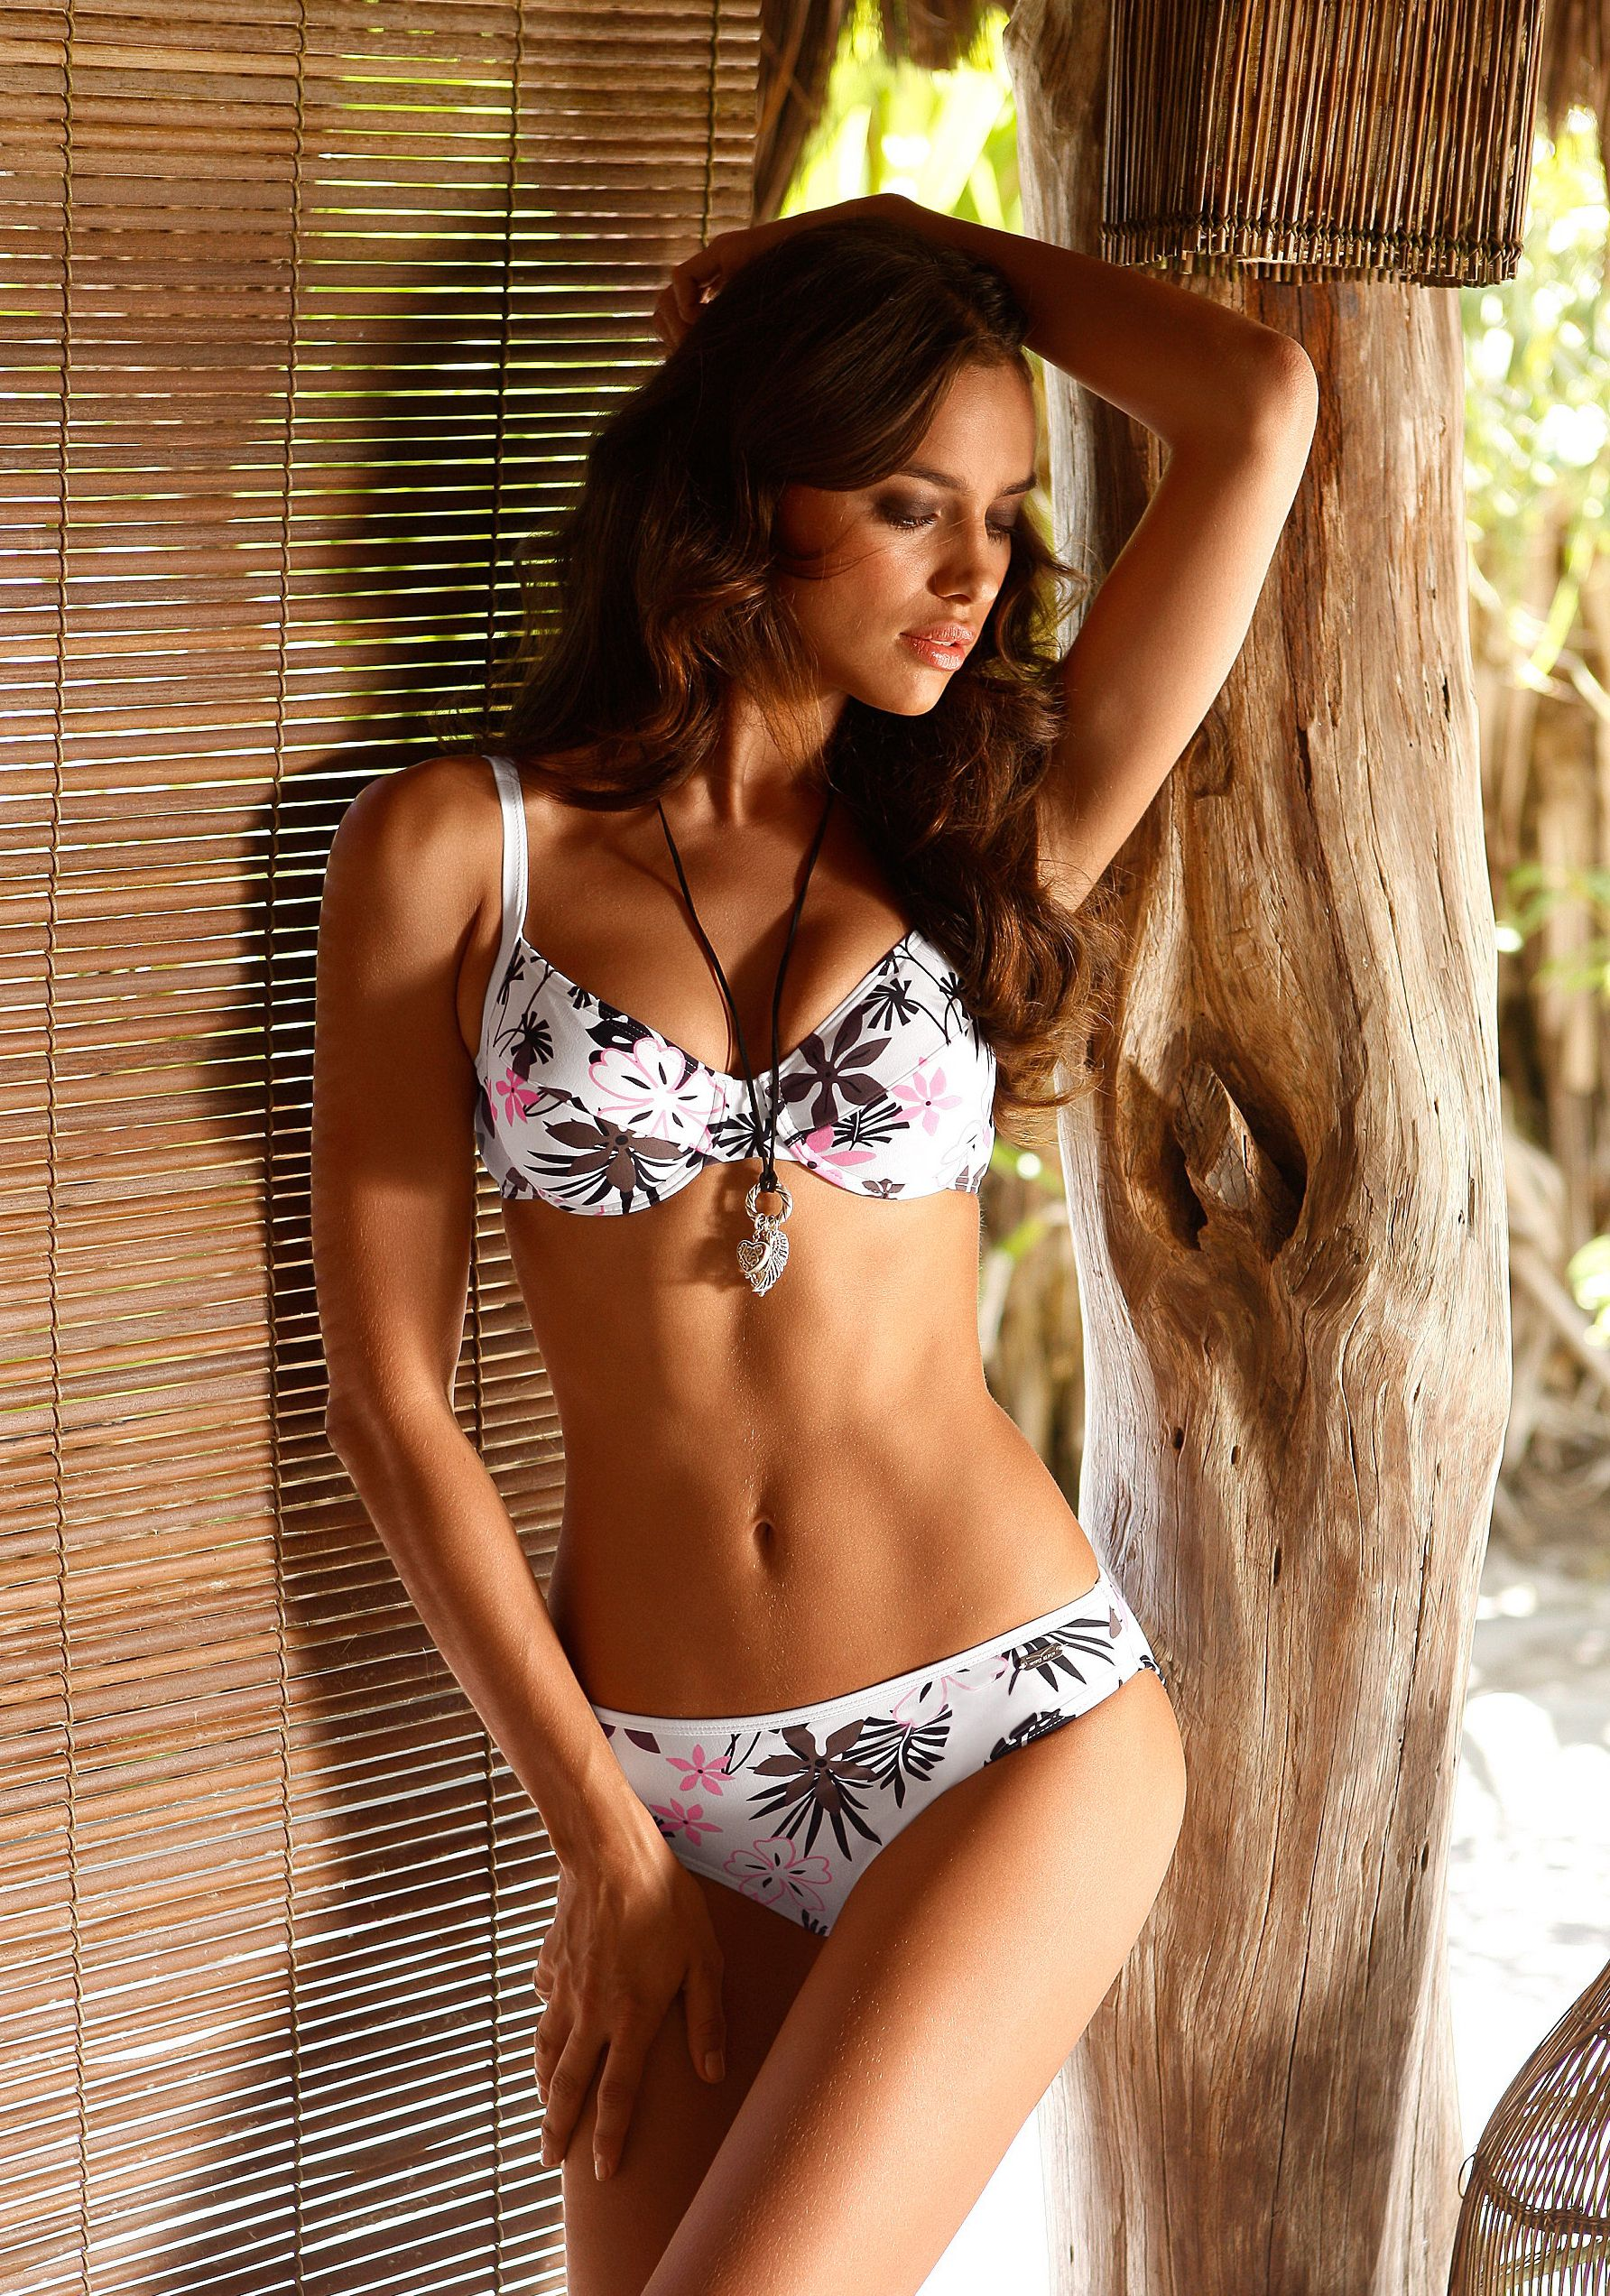 09189_Irina_Sheik_Lascana_Swimwear_Lingerie_Photoshoot23_122_230lo.jpg